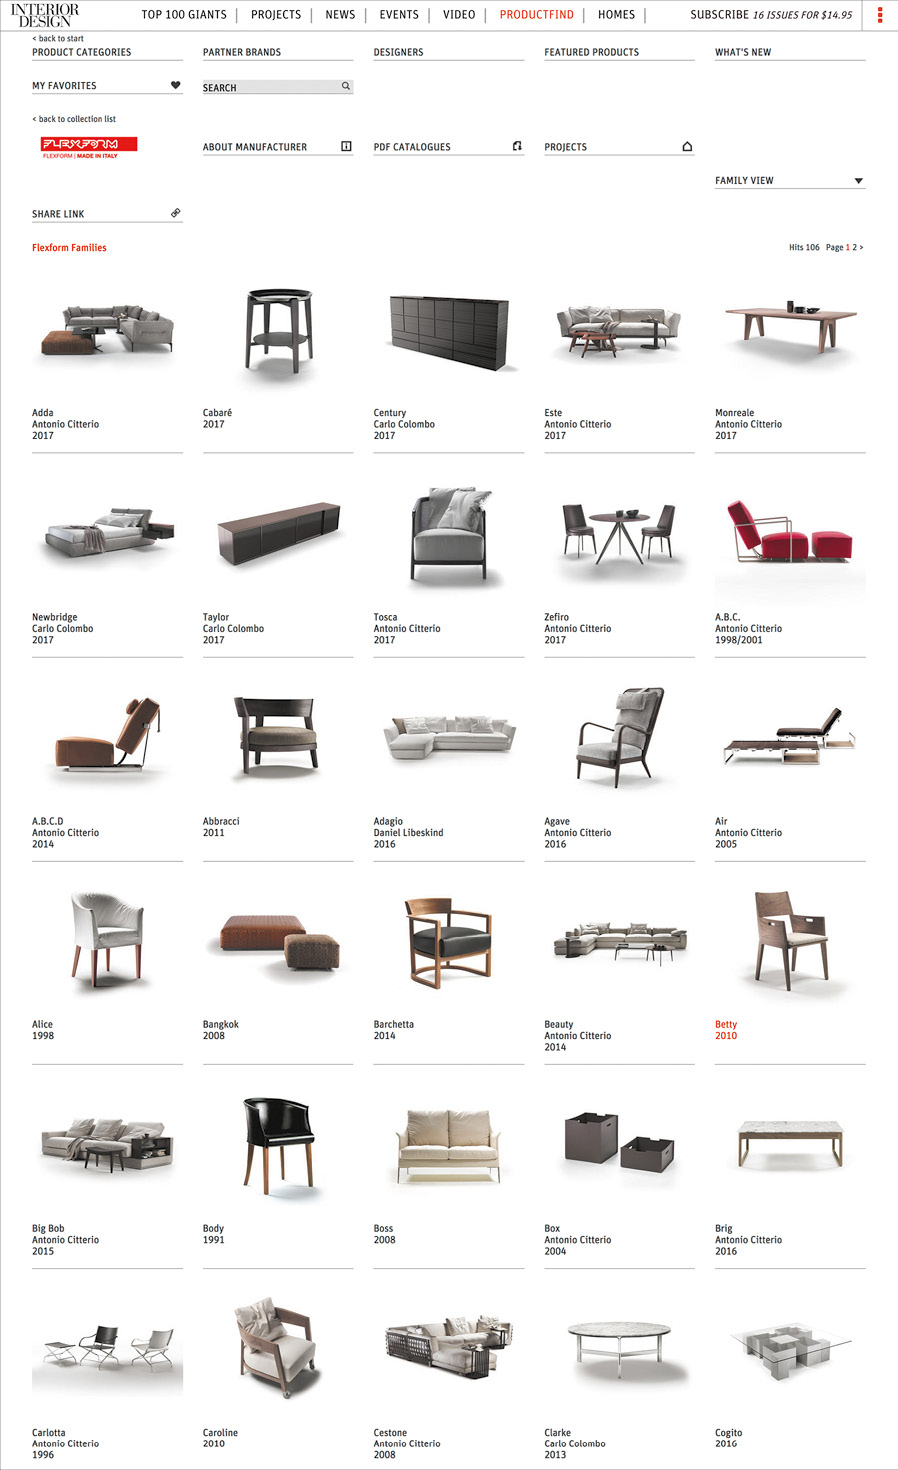 interiordesign_productfind.jpg